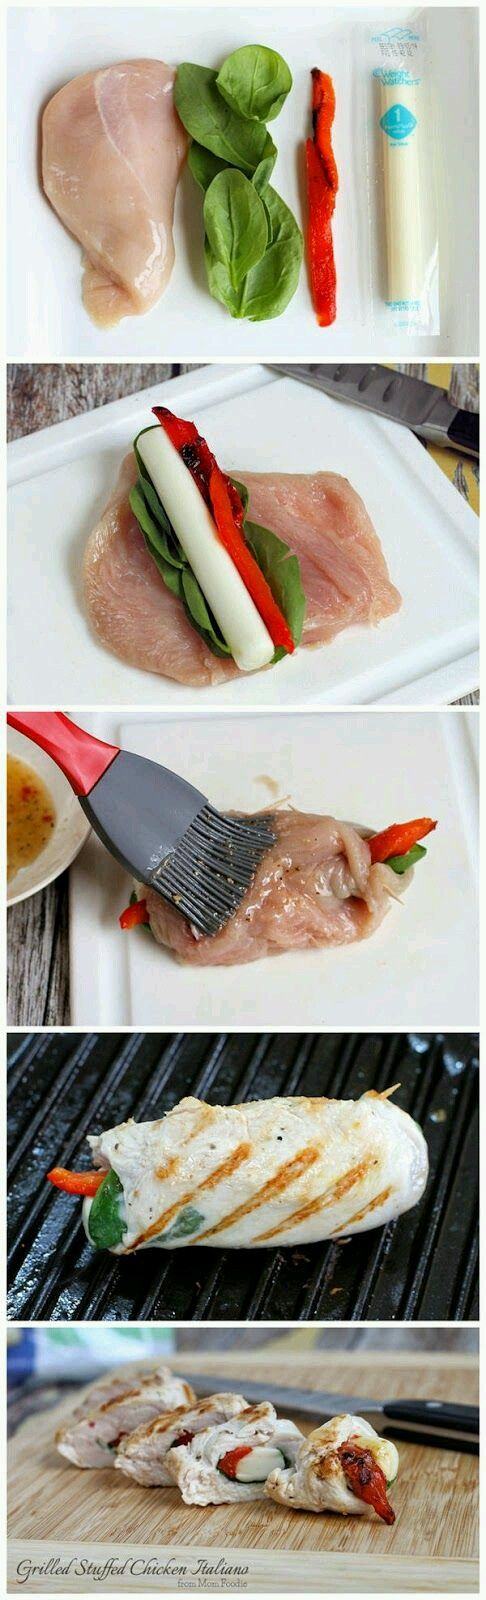 Grilled Chicken italia Roll ups #Food #Drink #Trusper #Tip